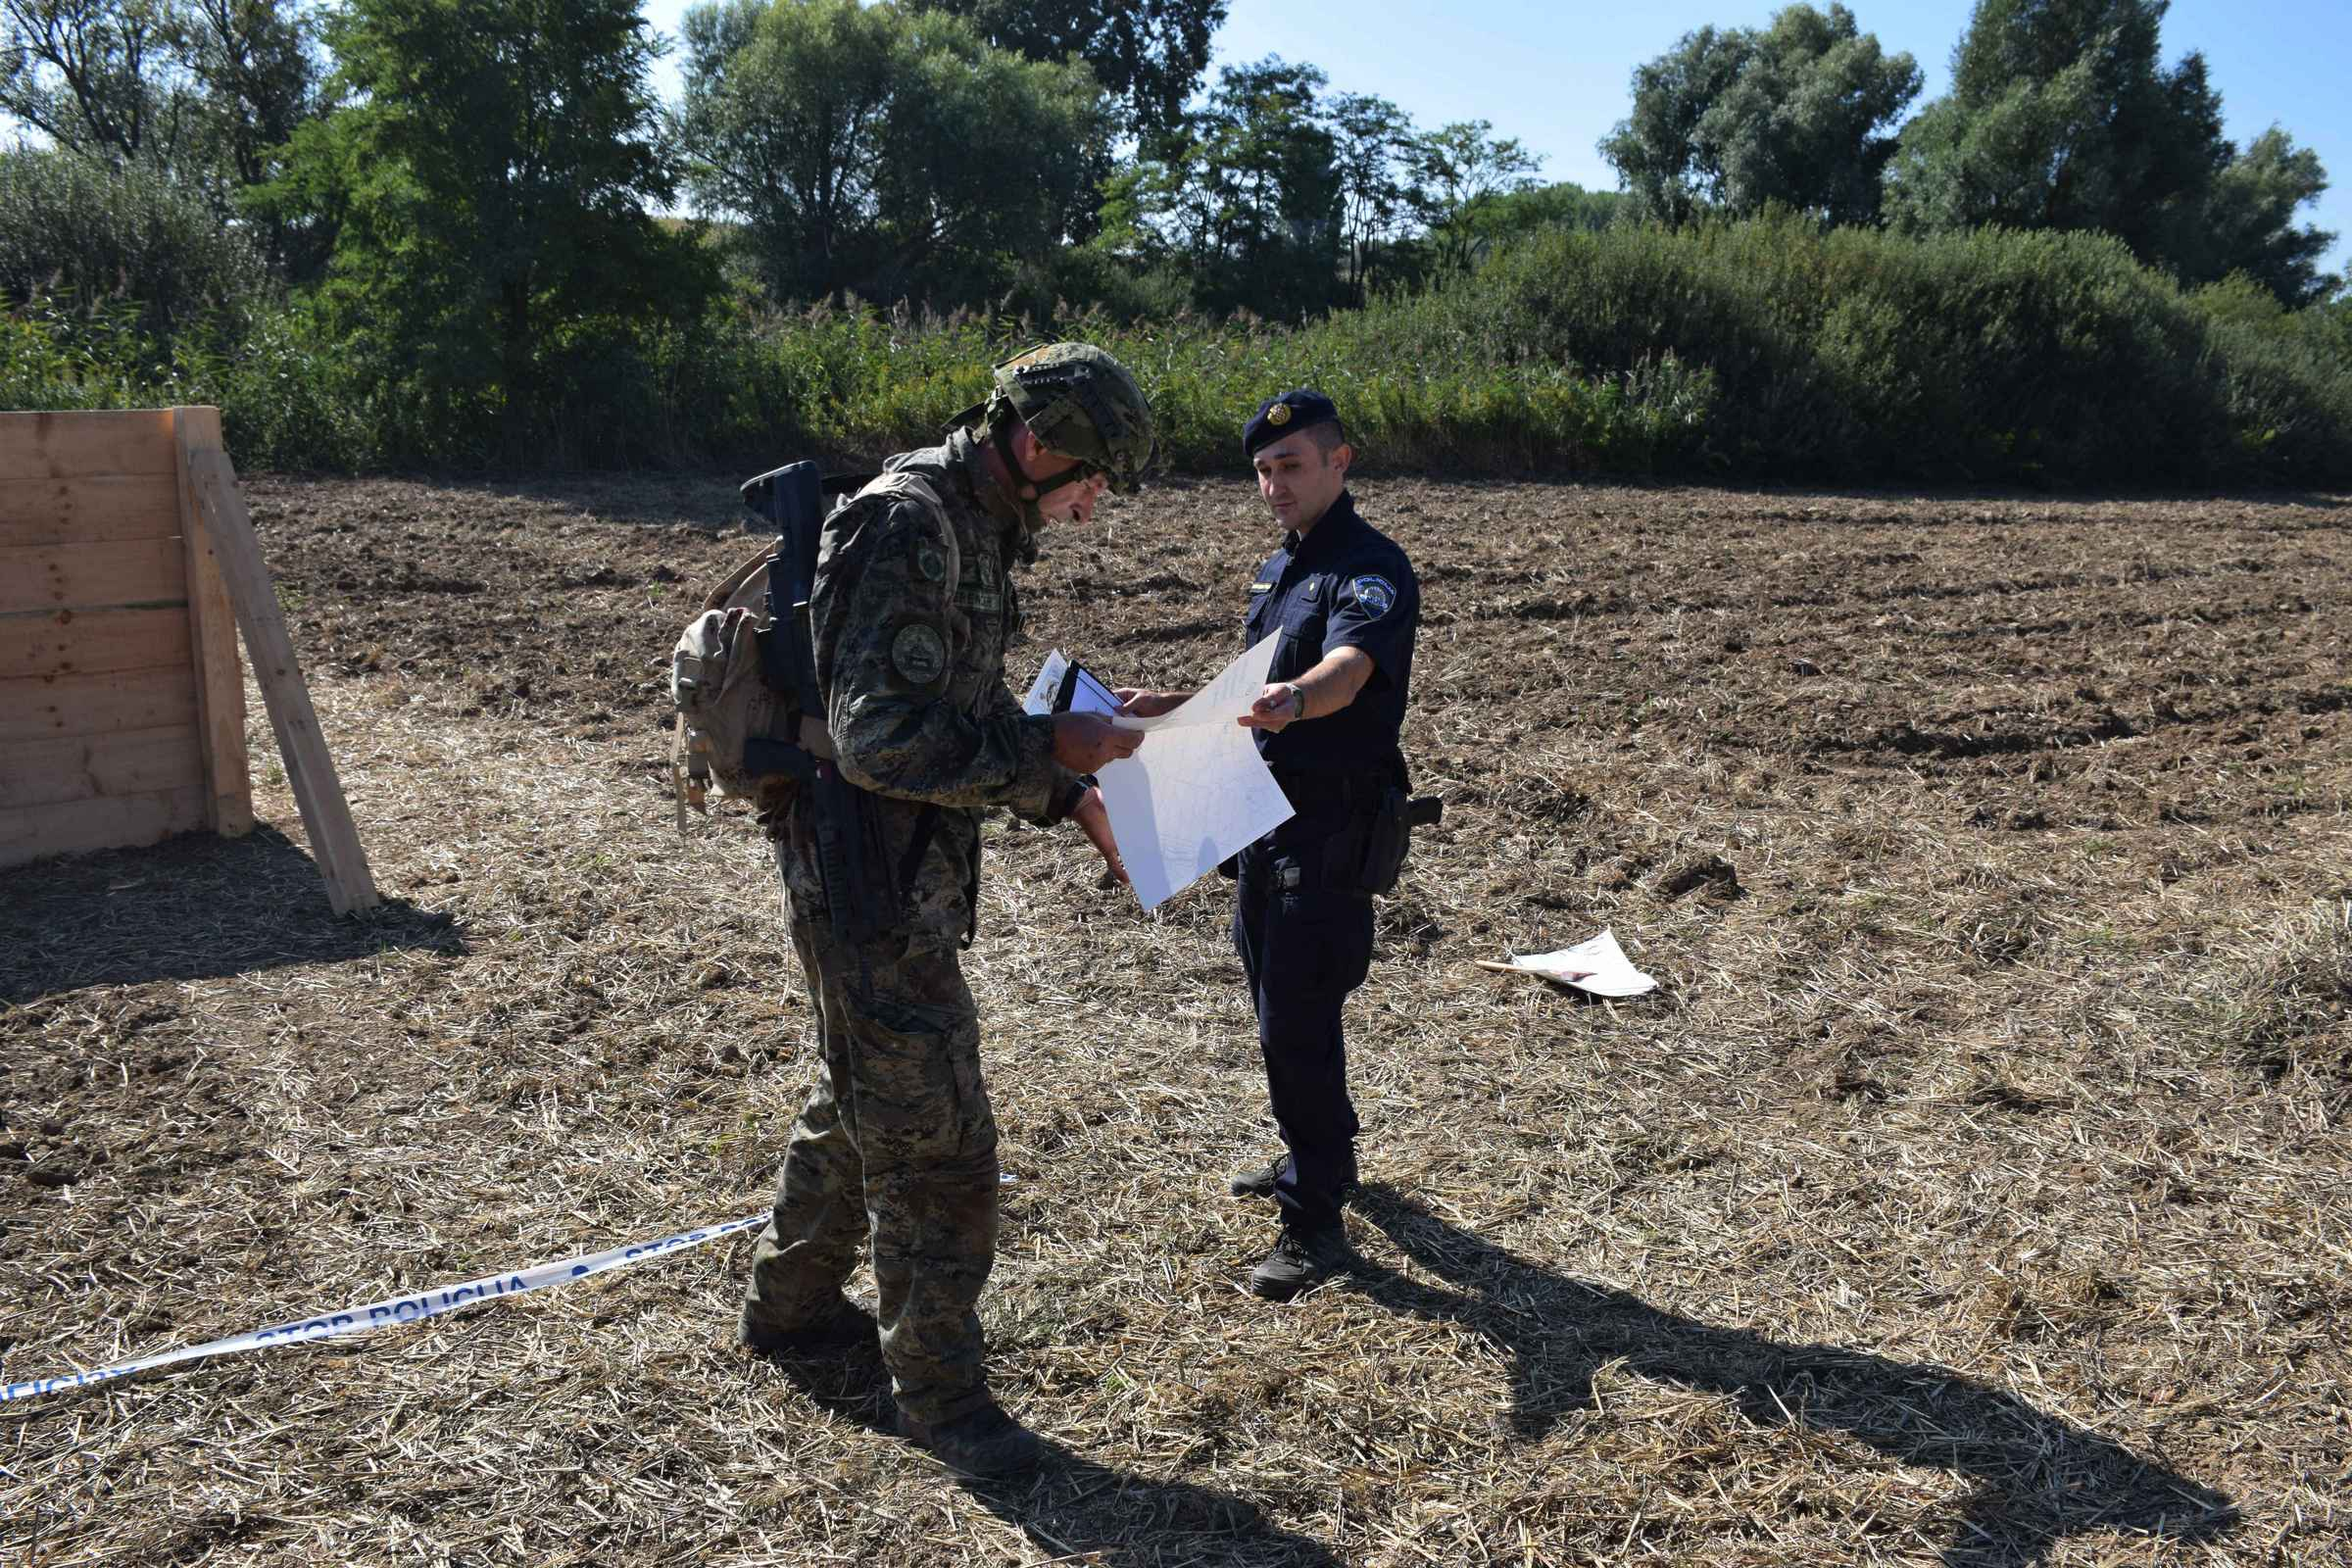 Hrvatska vojska na 3. memorijalu Šimo Đamić - Štit Domovine u Vukovaru